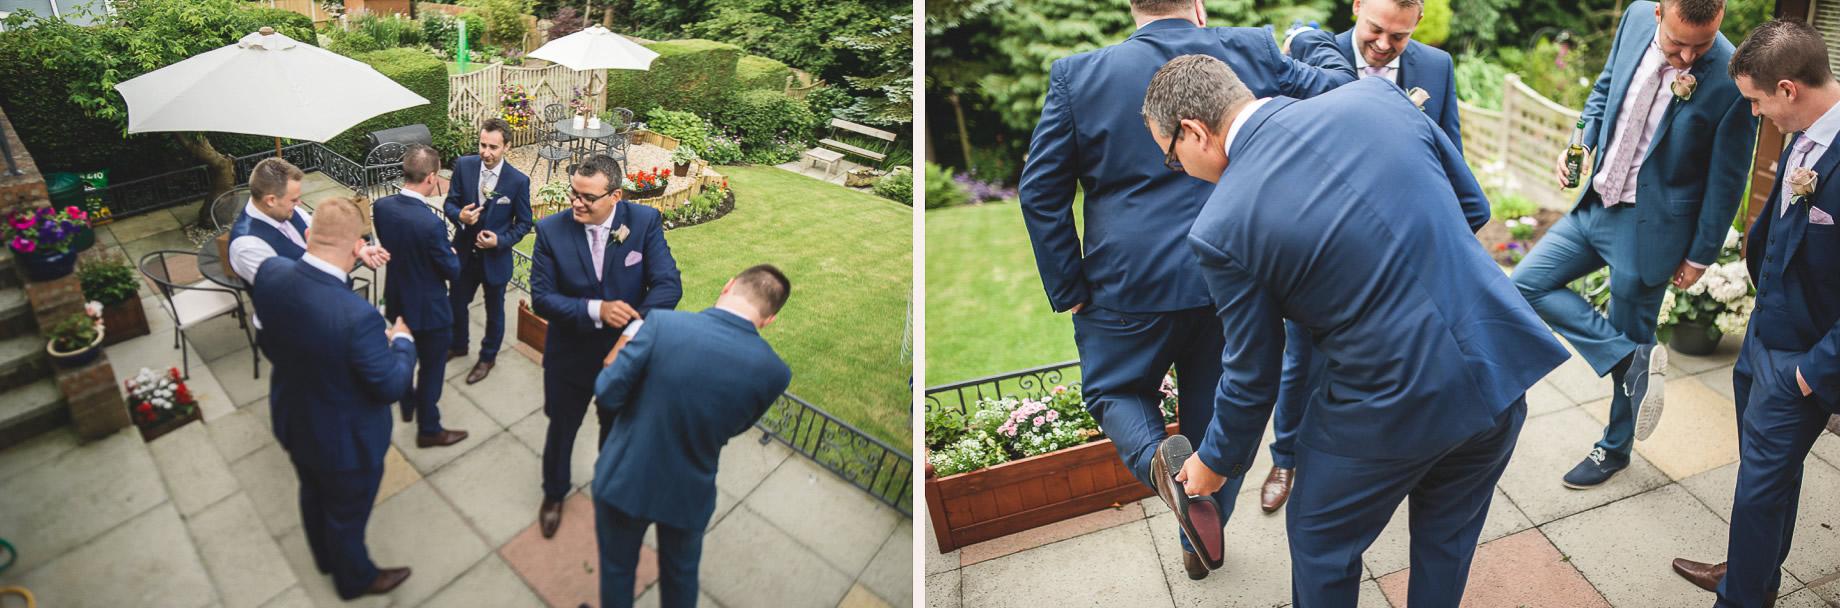 Helen and Matt's Wedding at Mitton Hall 011